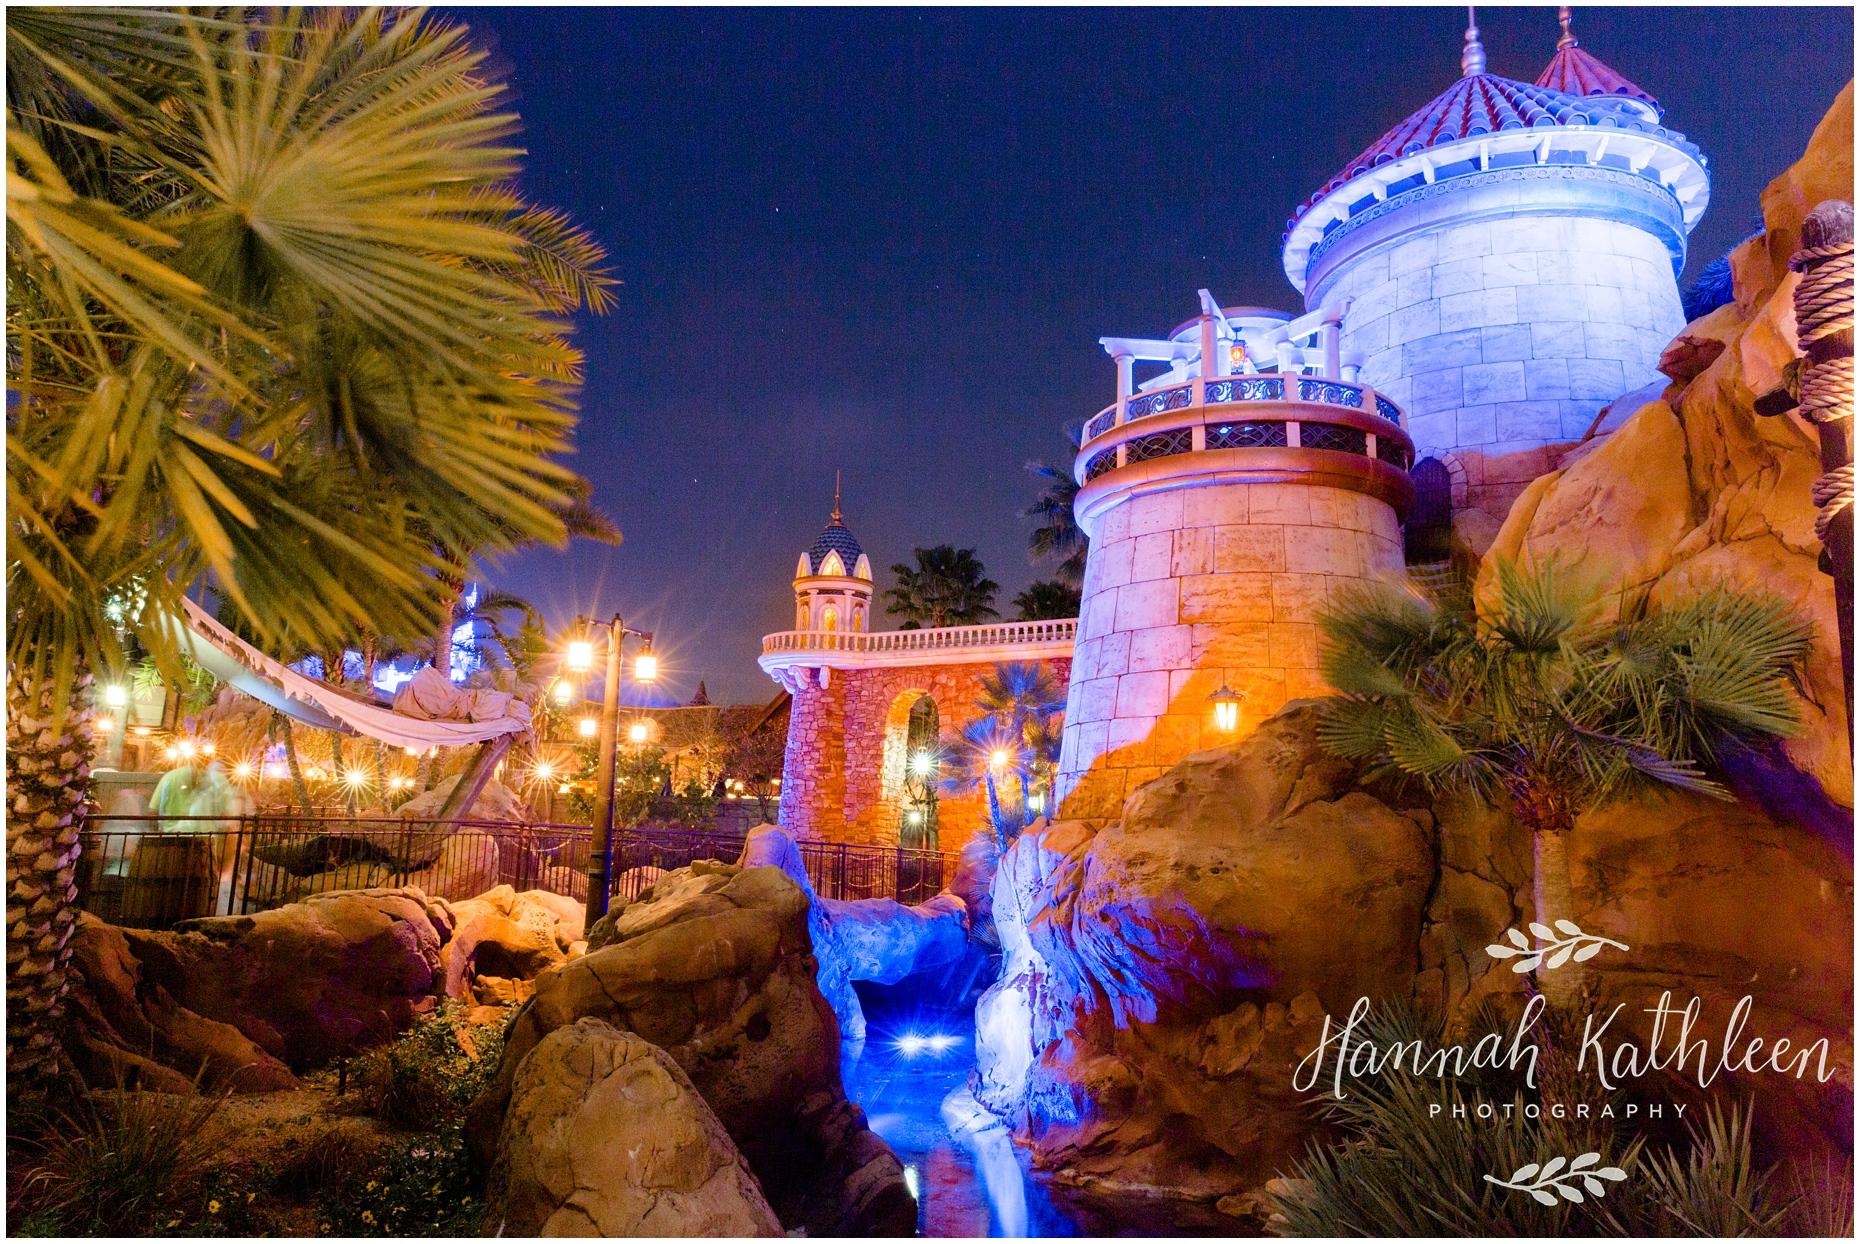 Snowbird_Walt_Disney_World_Parks_Photography